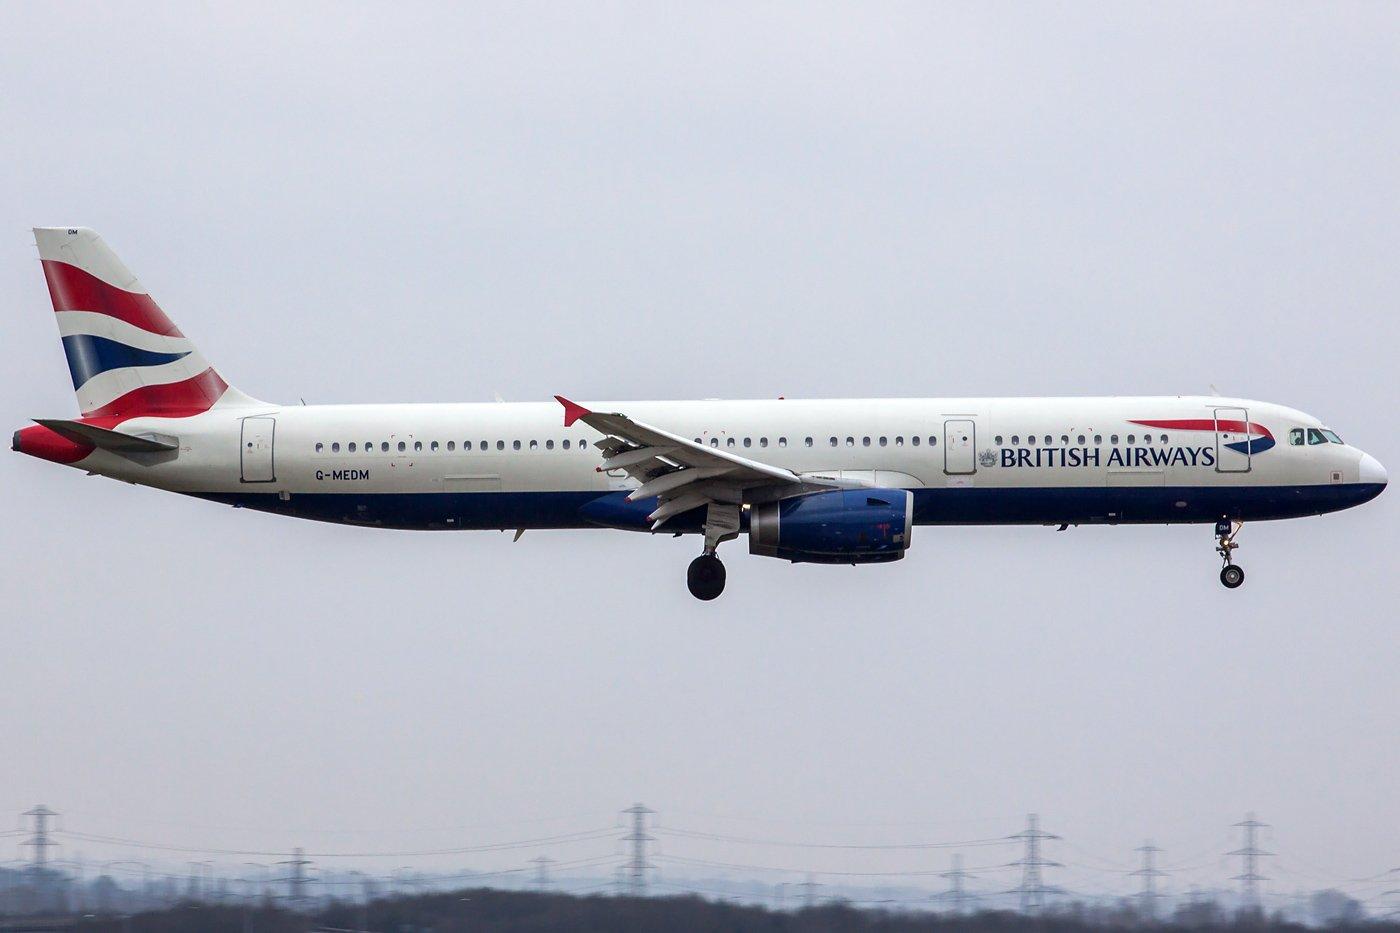 British Airways Airbus A321-231 G-MEDM